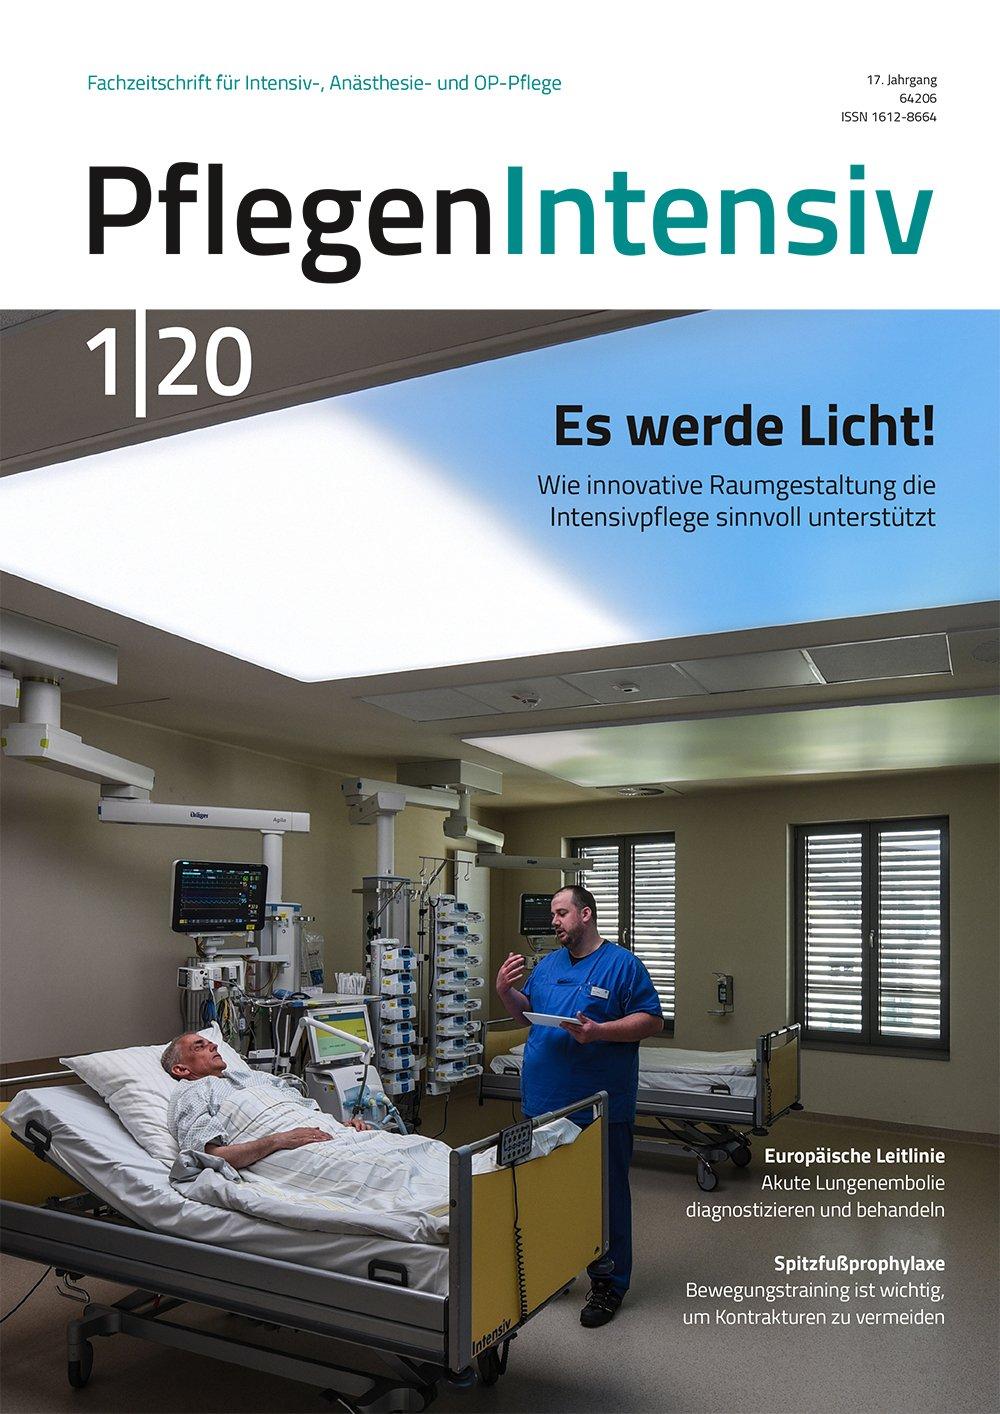 Titel_01-2020_RZ.indd